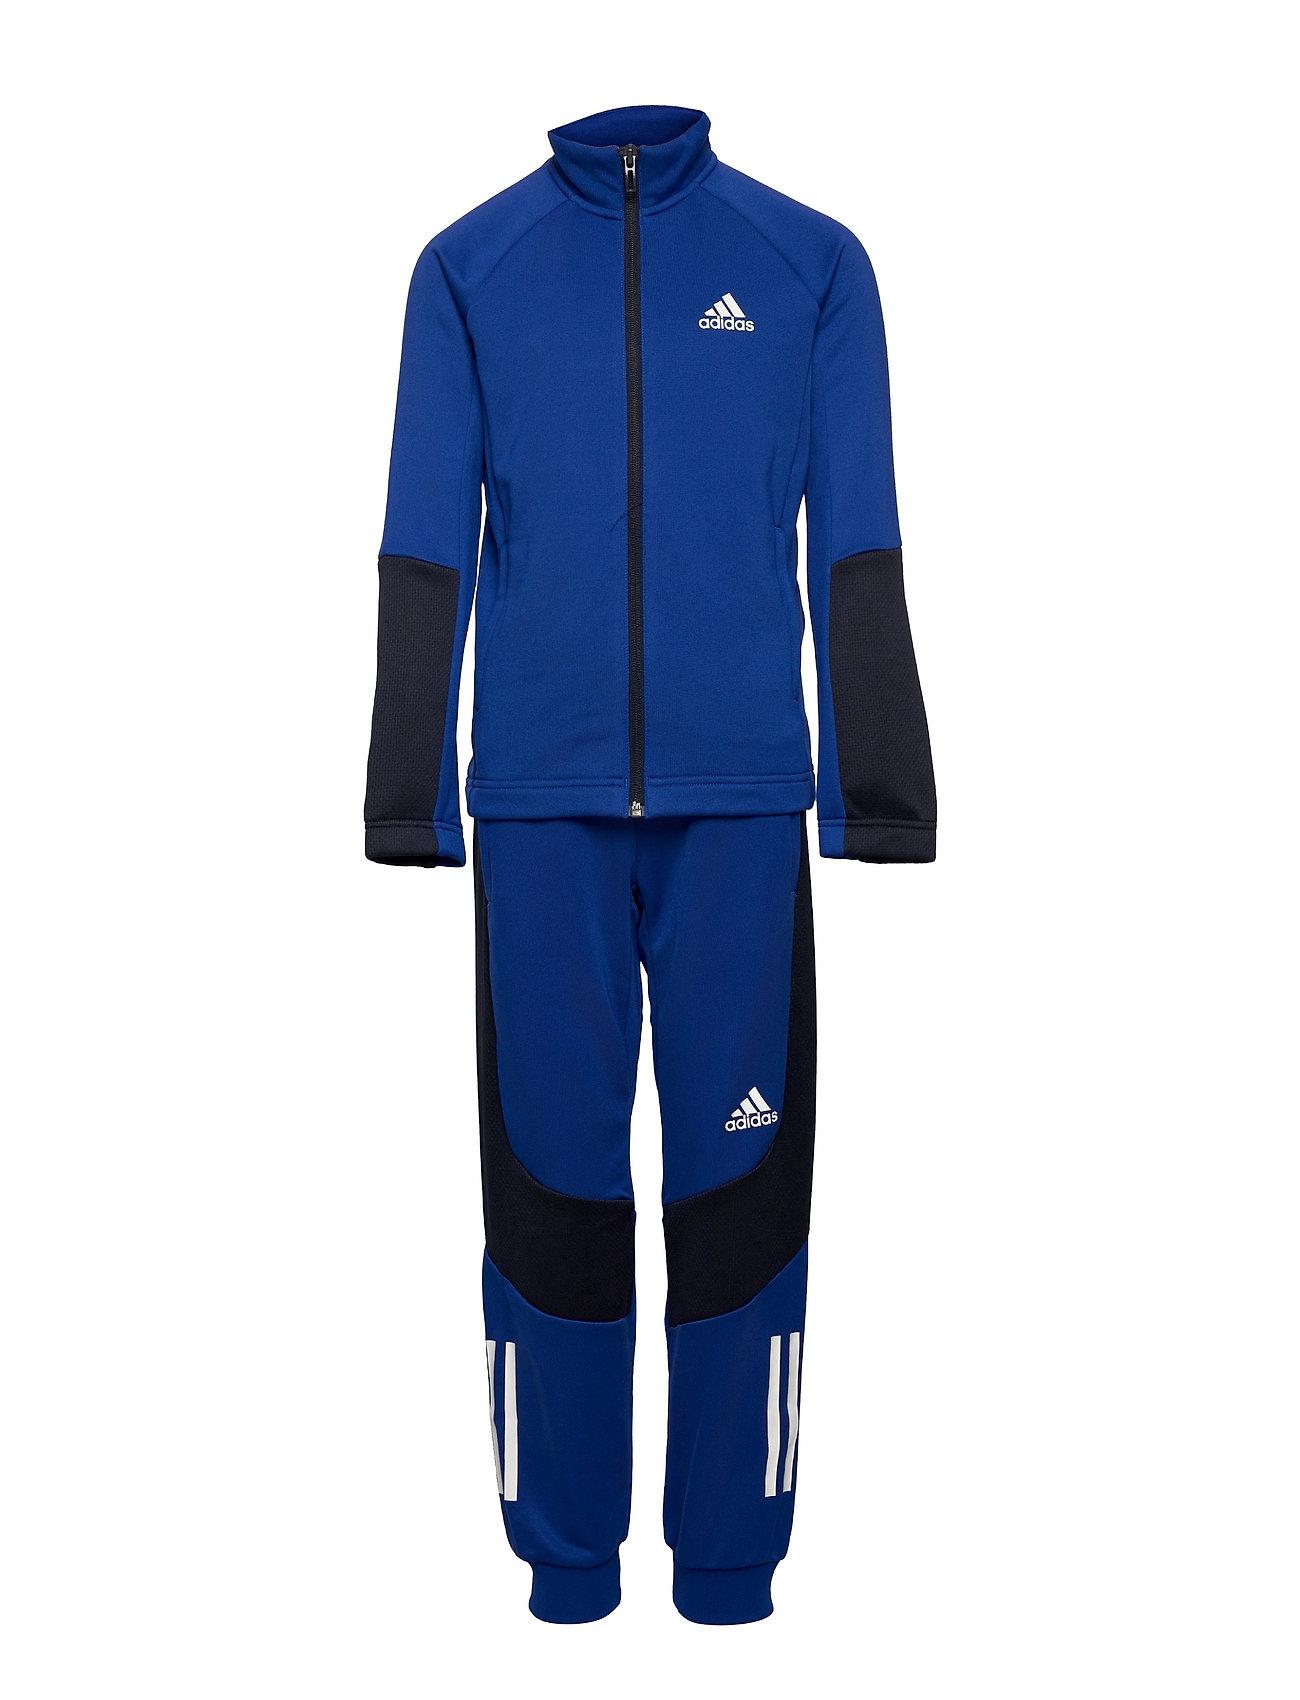 Xfg Aeroready Track Suit Tracksuit Blå Adidas Performance